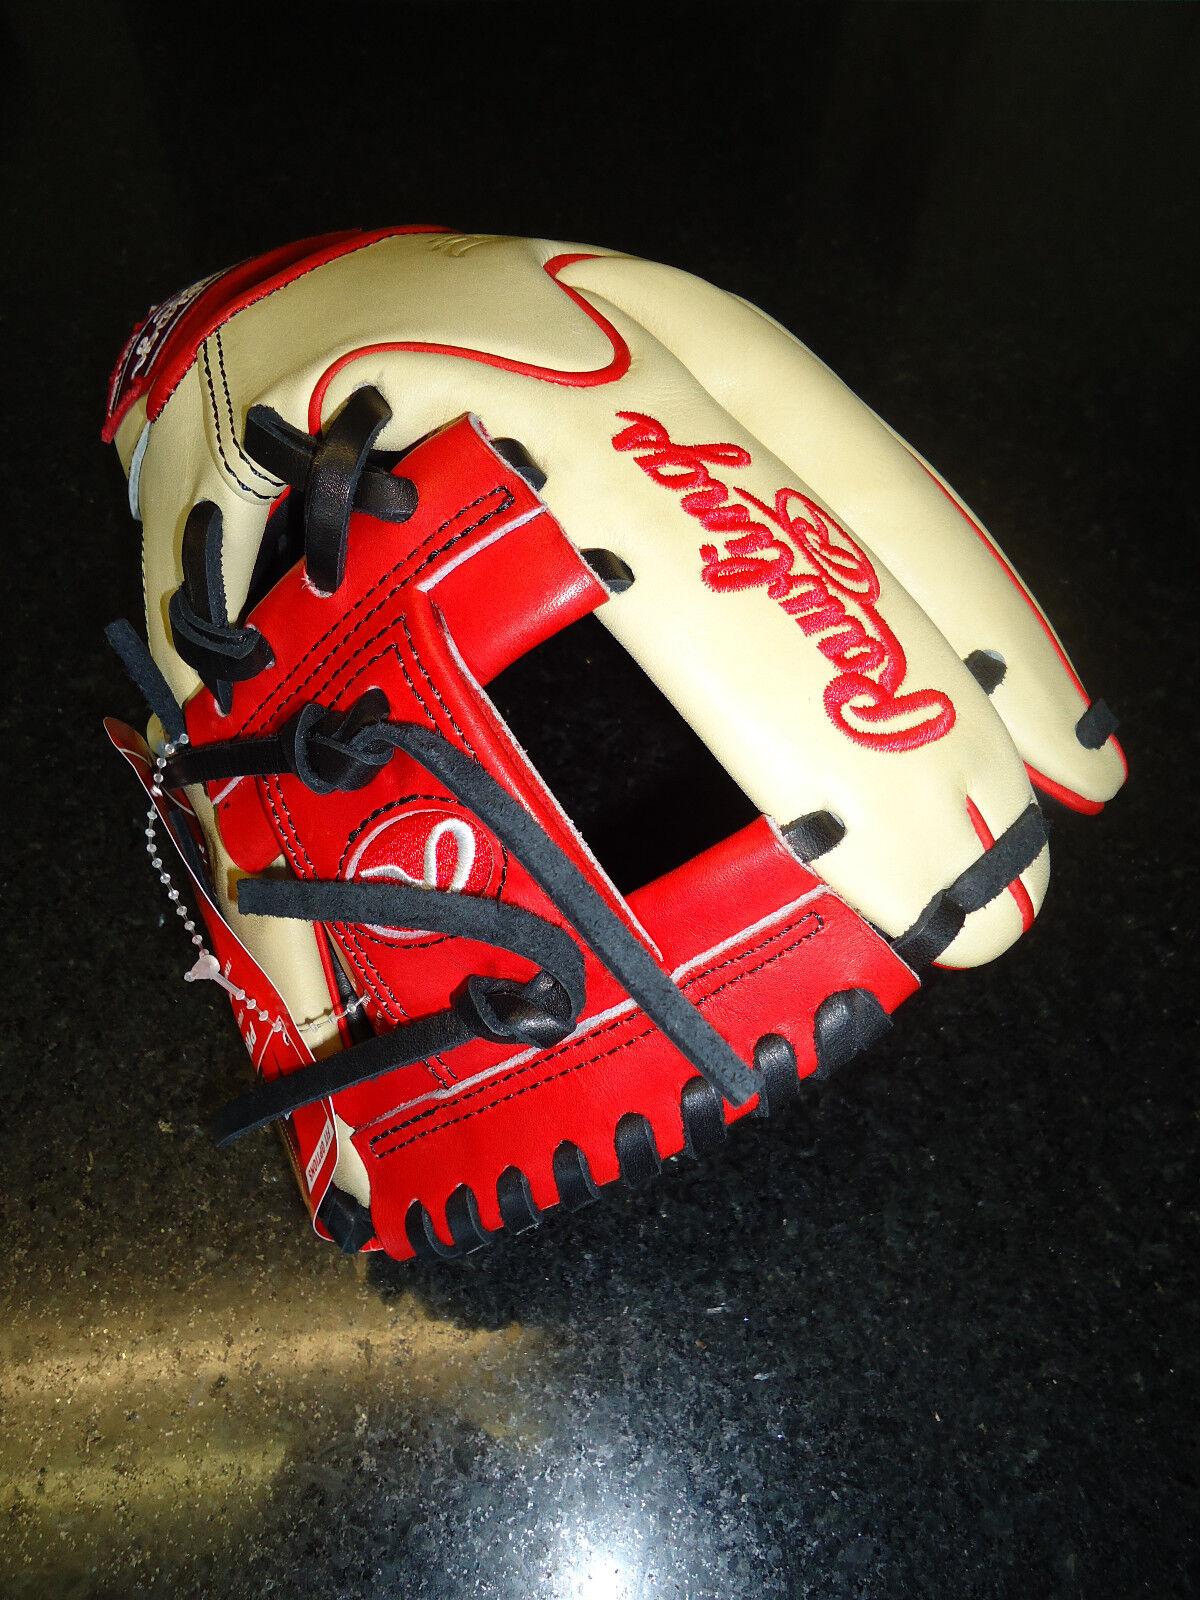 Rawlings Pro preferido pros 204-2 bcwt Guante de béisbol 11.5  RH -  359.99